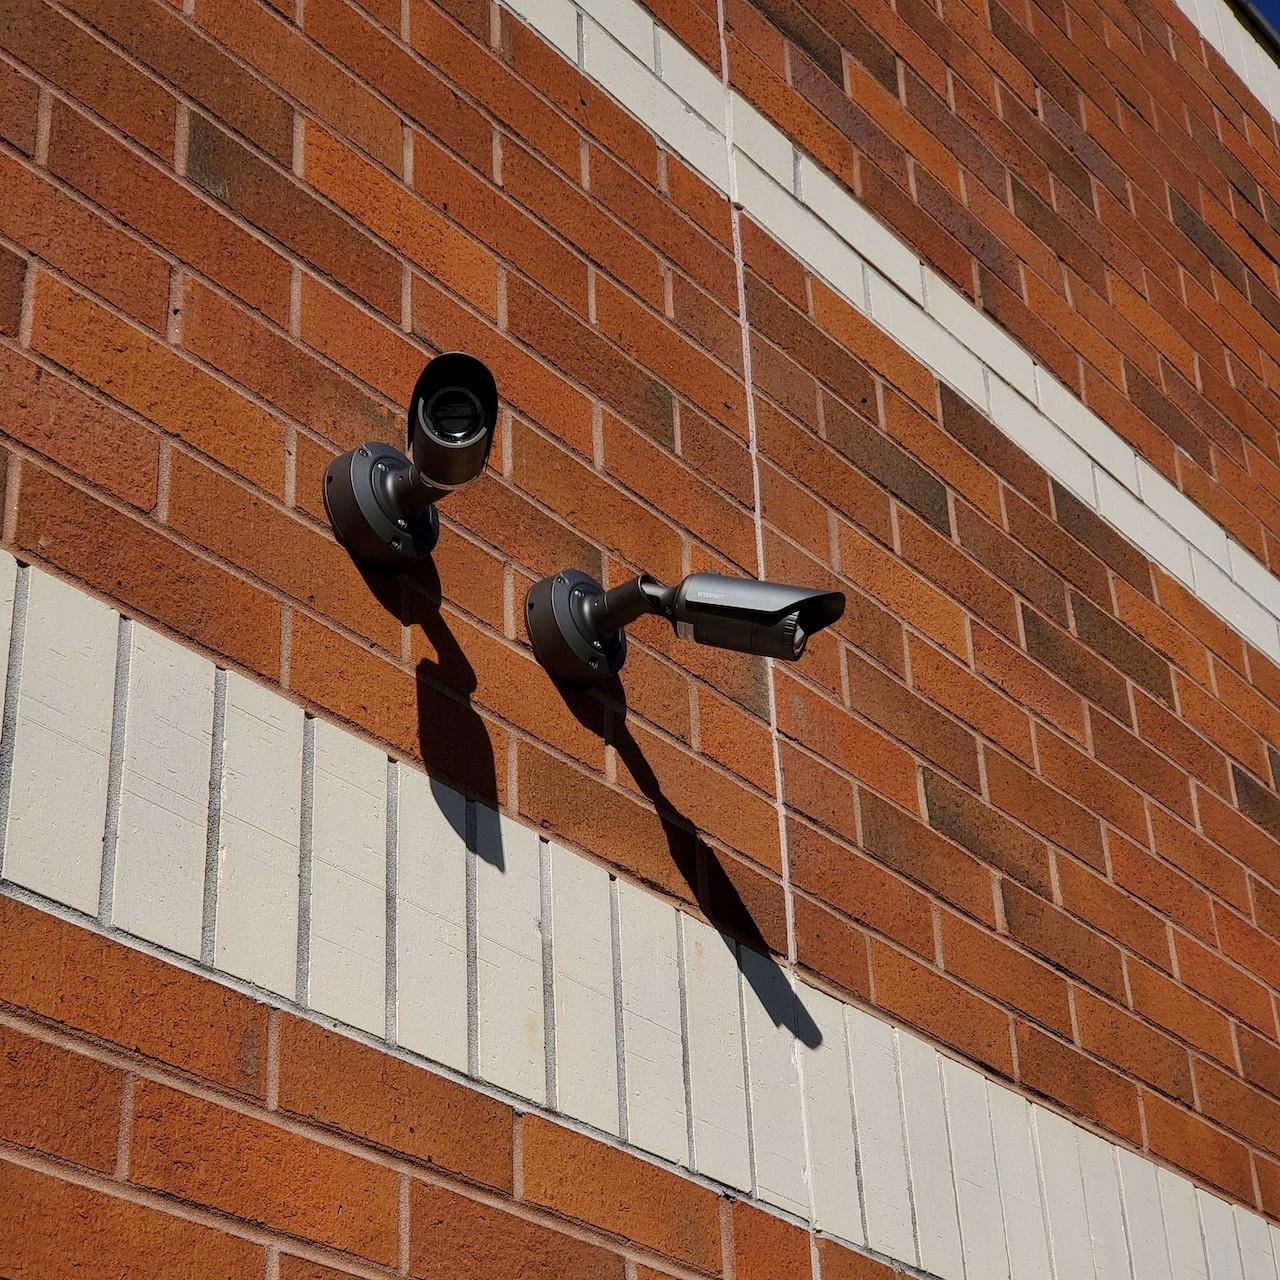 CCTV / IP Cameras